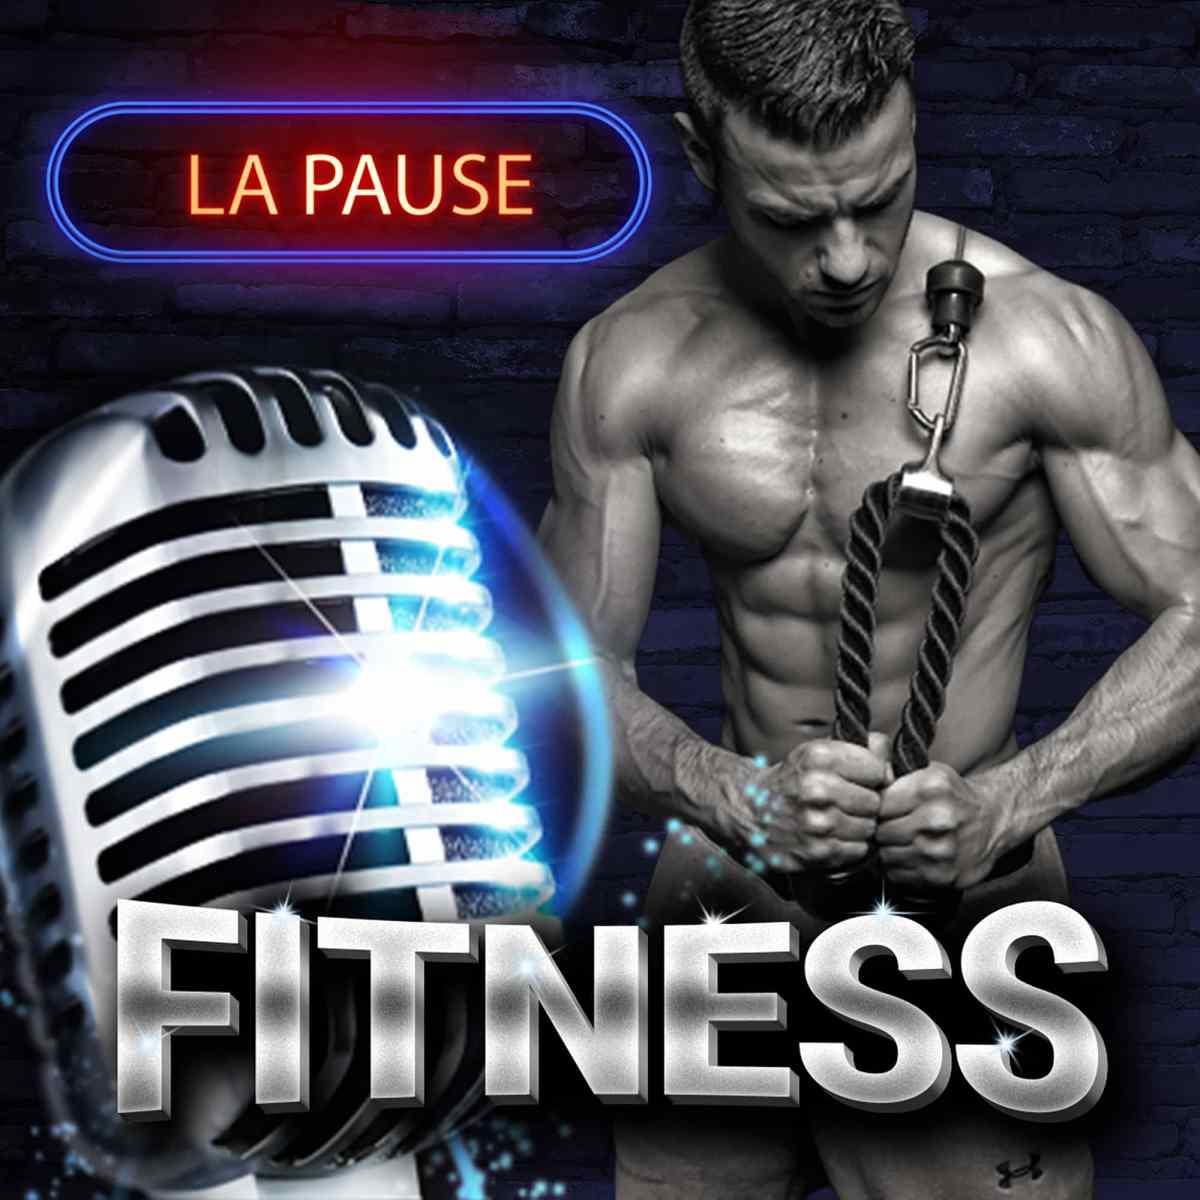 La pause Fitness